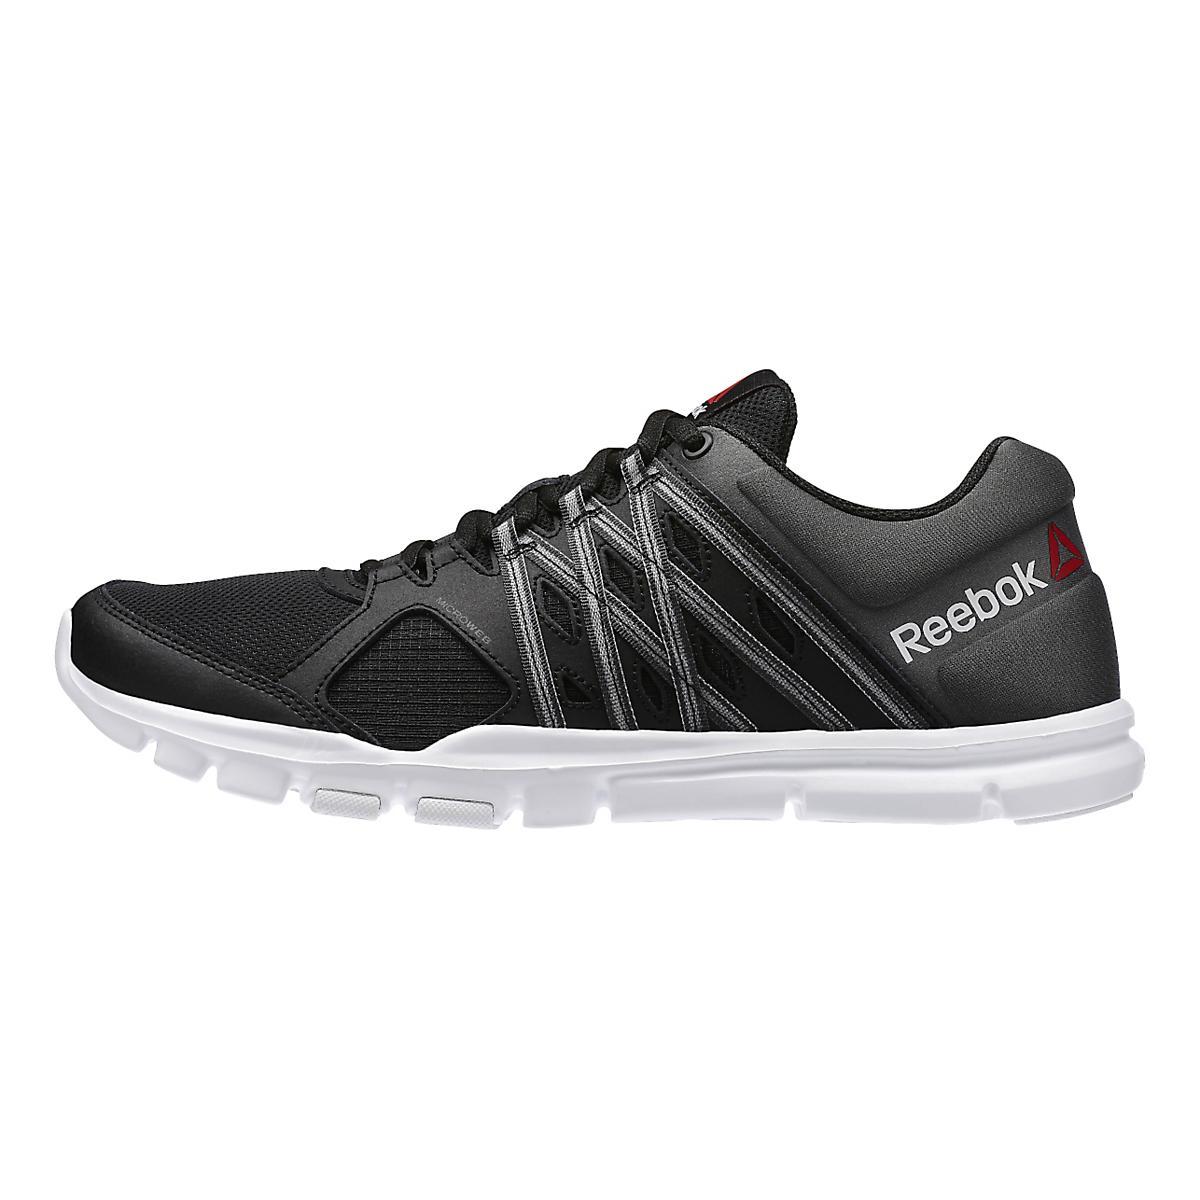 Mens Reebok YourFlex Train 8.0 L MT Cross Training Shoe at Road Runner  Sports 63a87e58c